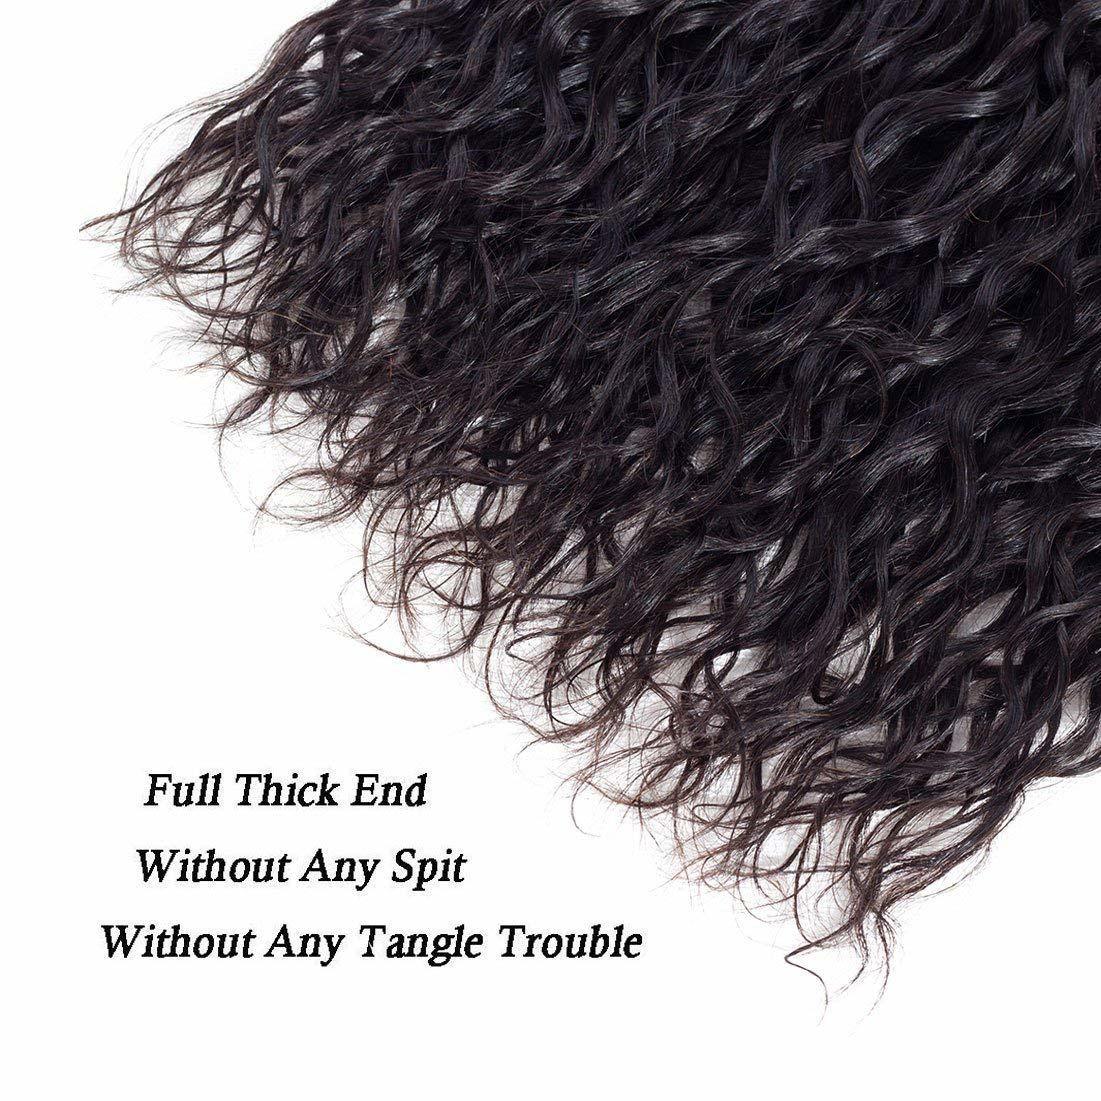 Brazilian Virgin Hair Water Wave Unprocessed Virgin Hair Extensions Water Wave Wholesale Hair